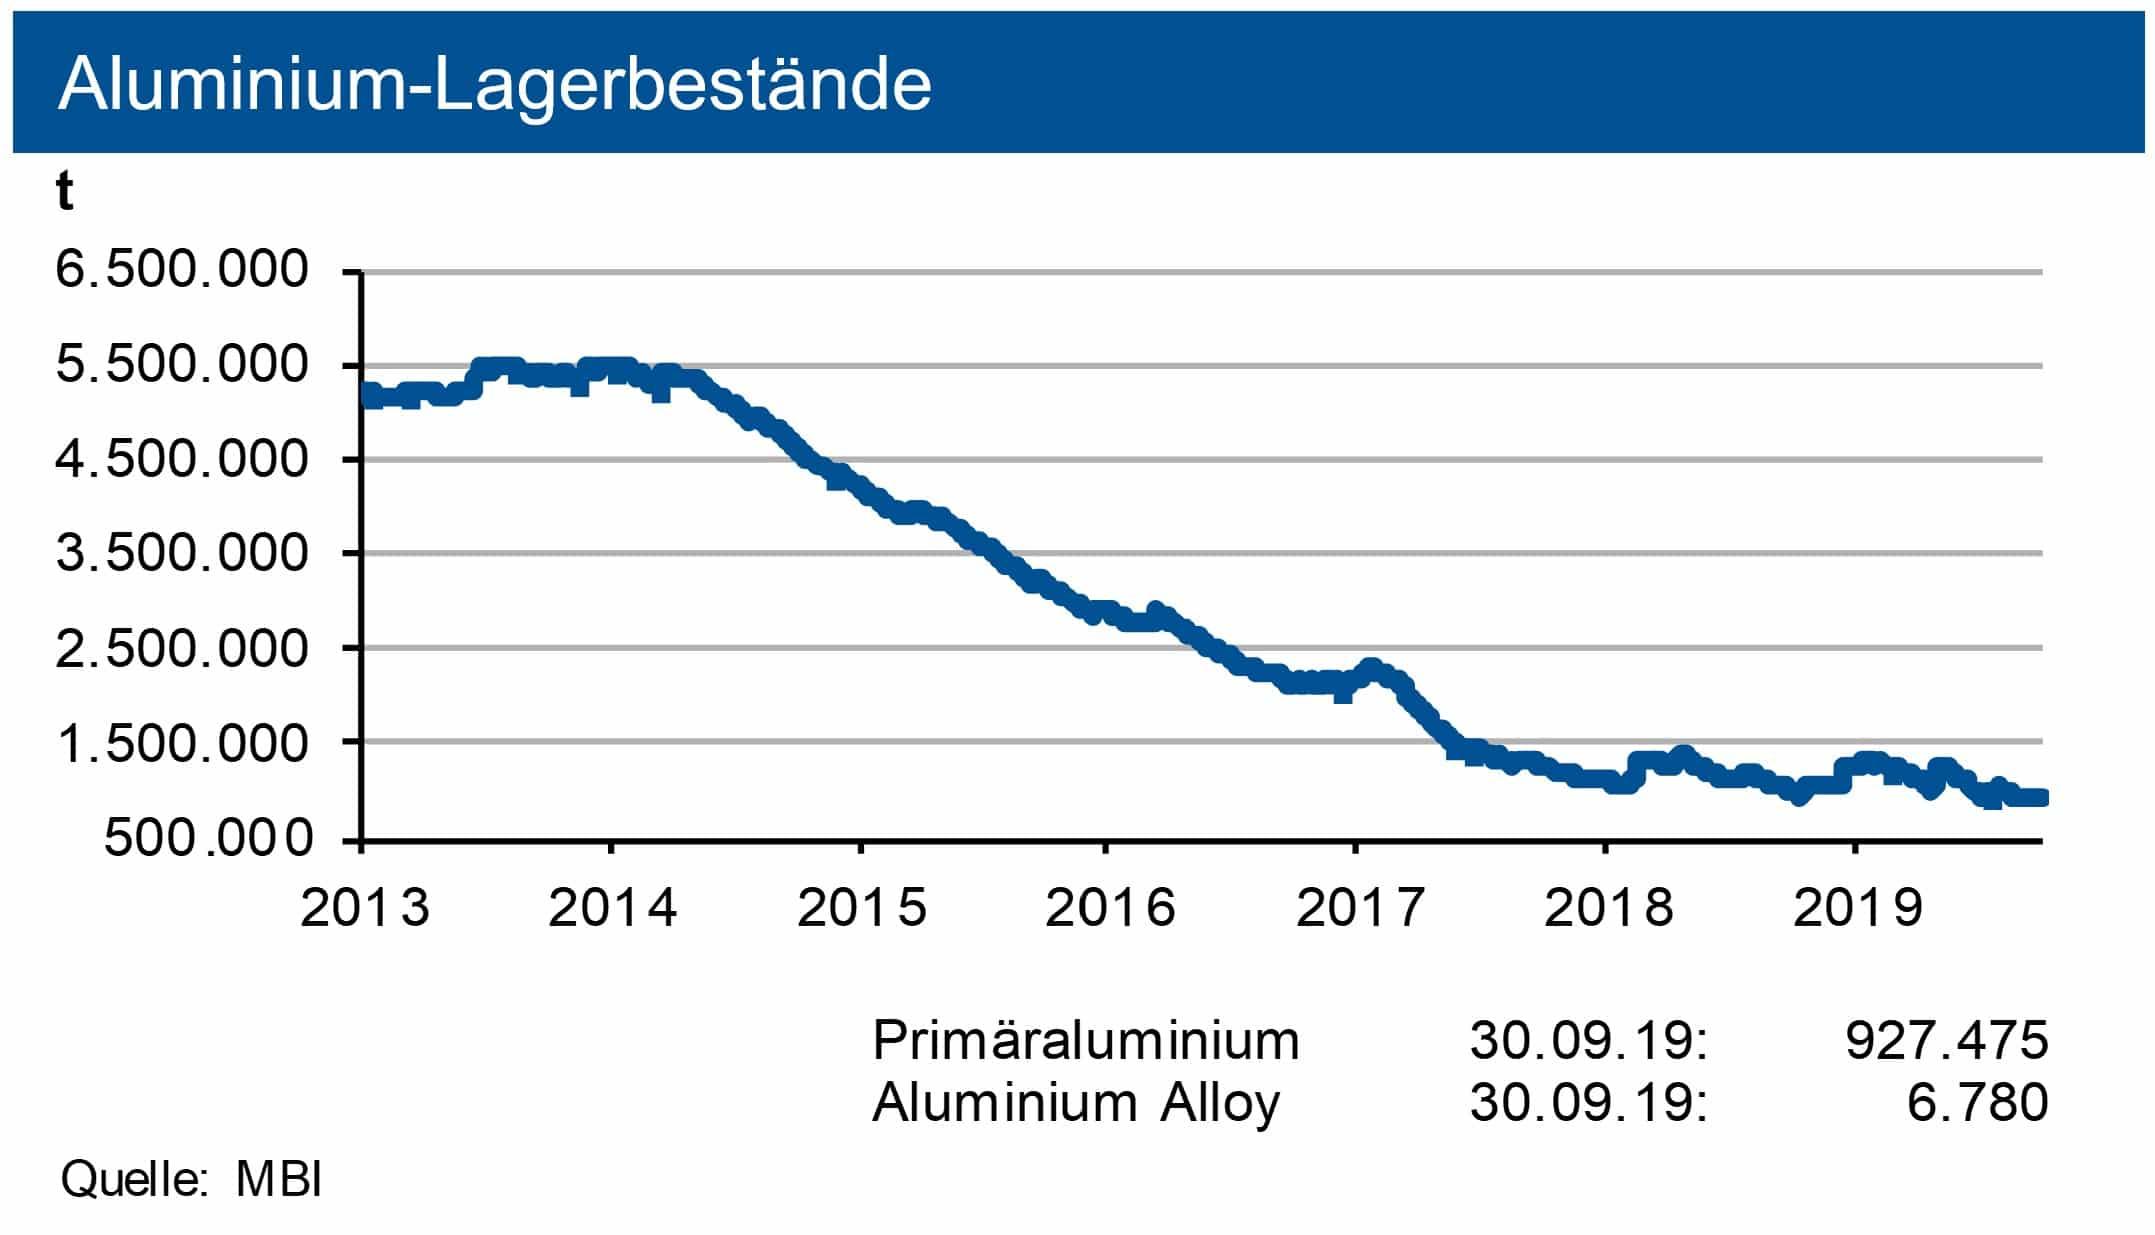 Aluminium-Lagerbestände